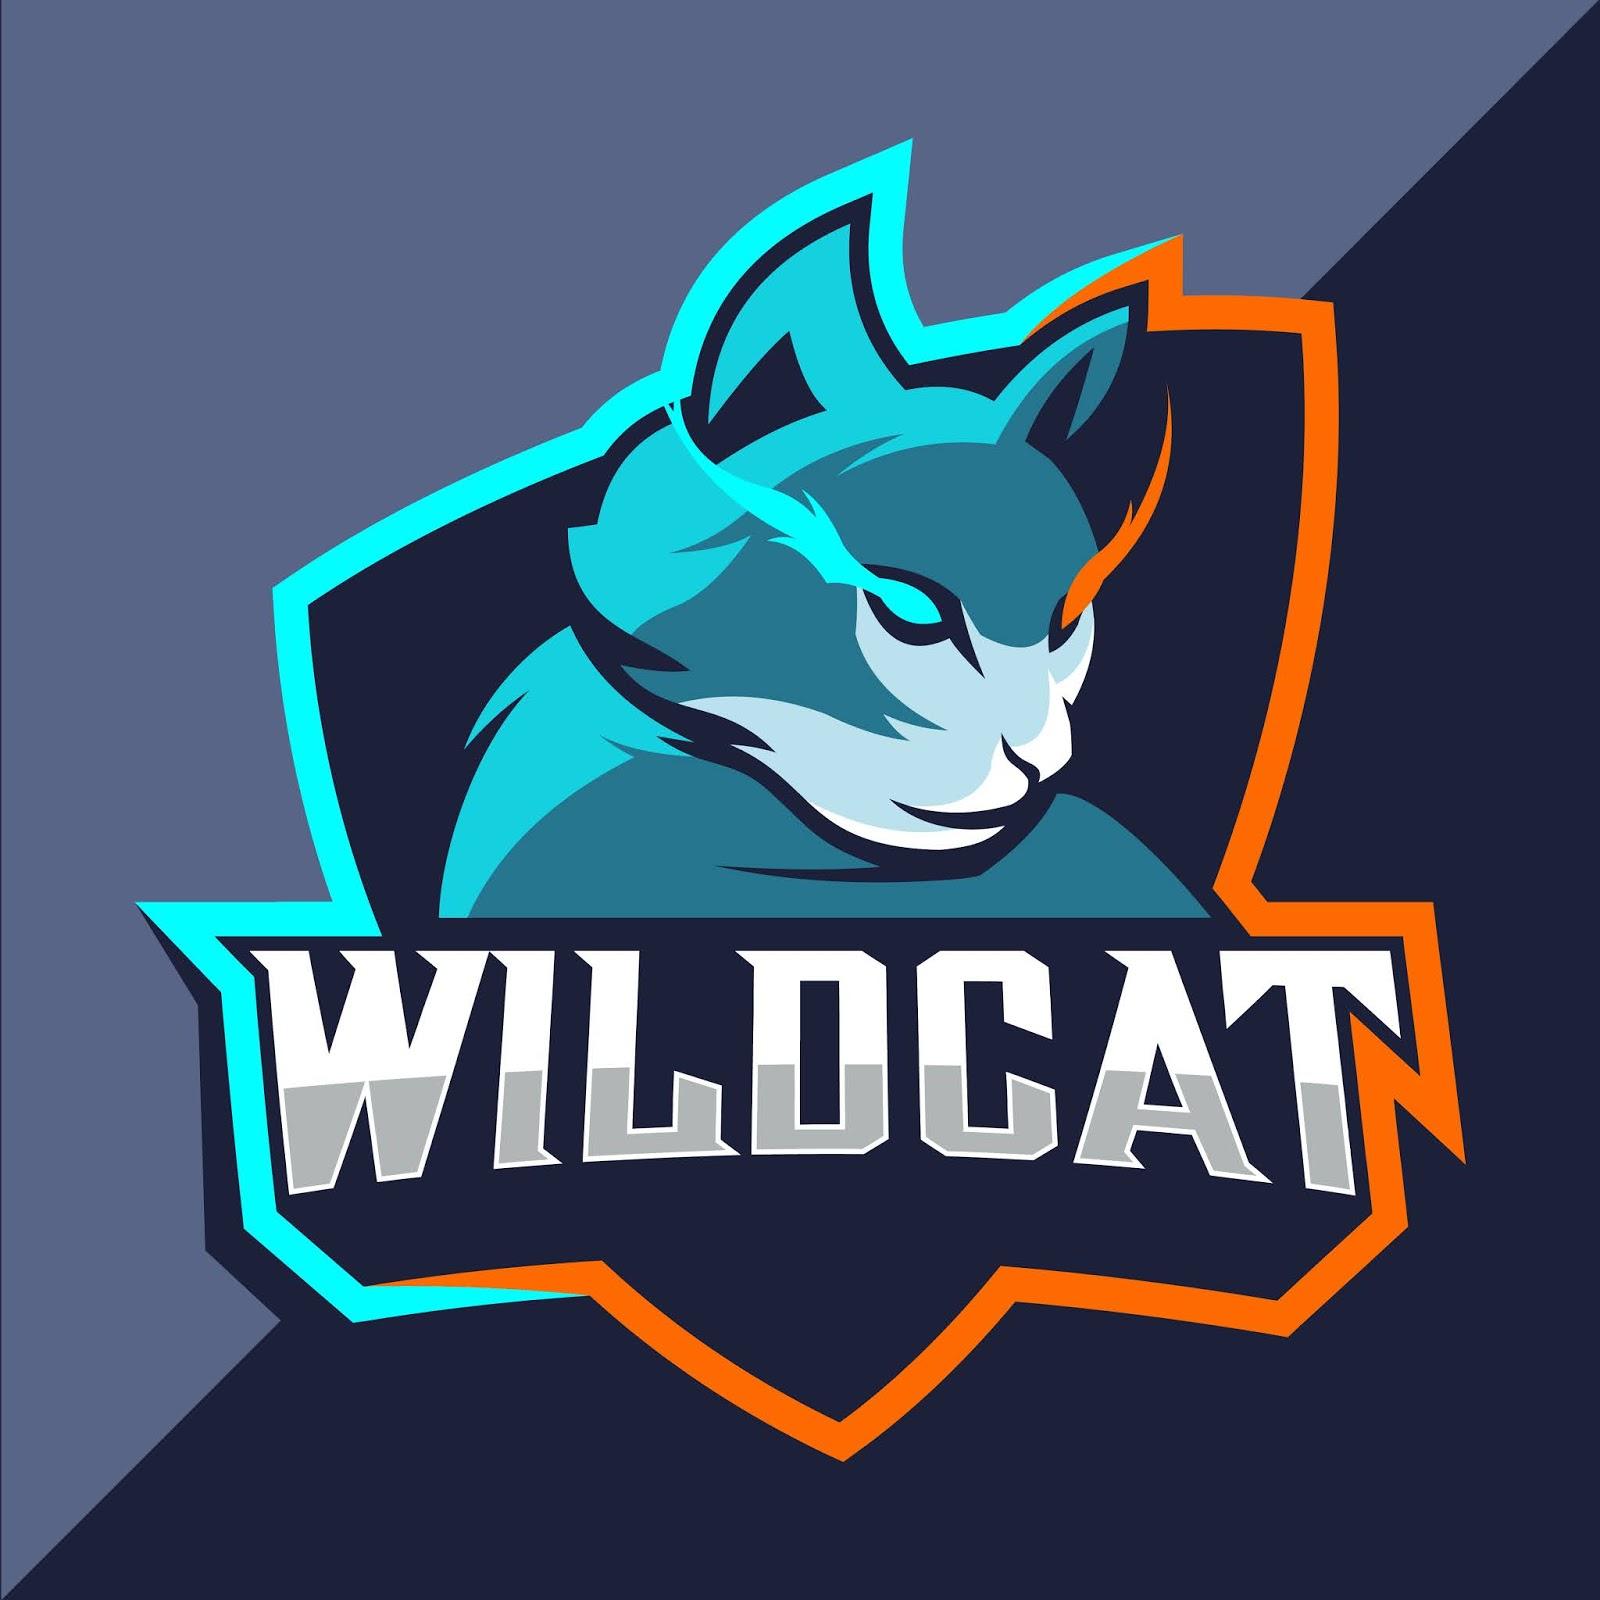 Wildcats Mascot Esport Free Download Vector CDR, AI, EPS and PNG Formats